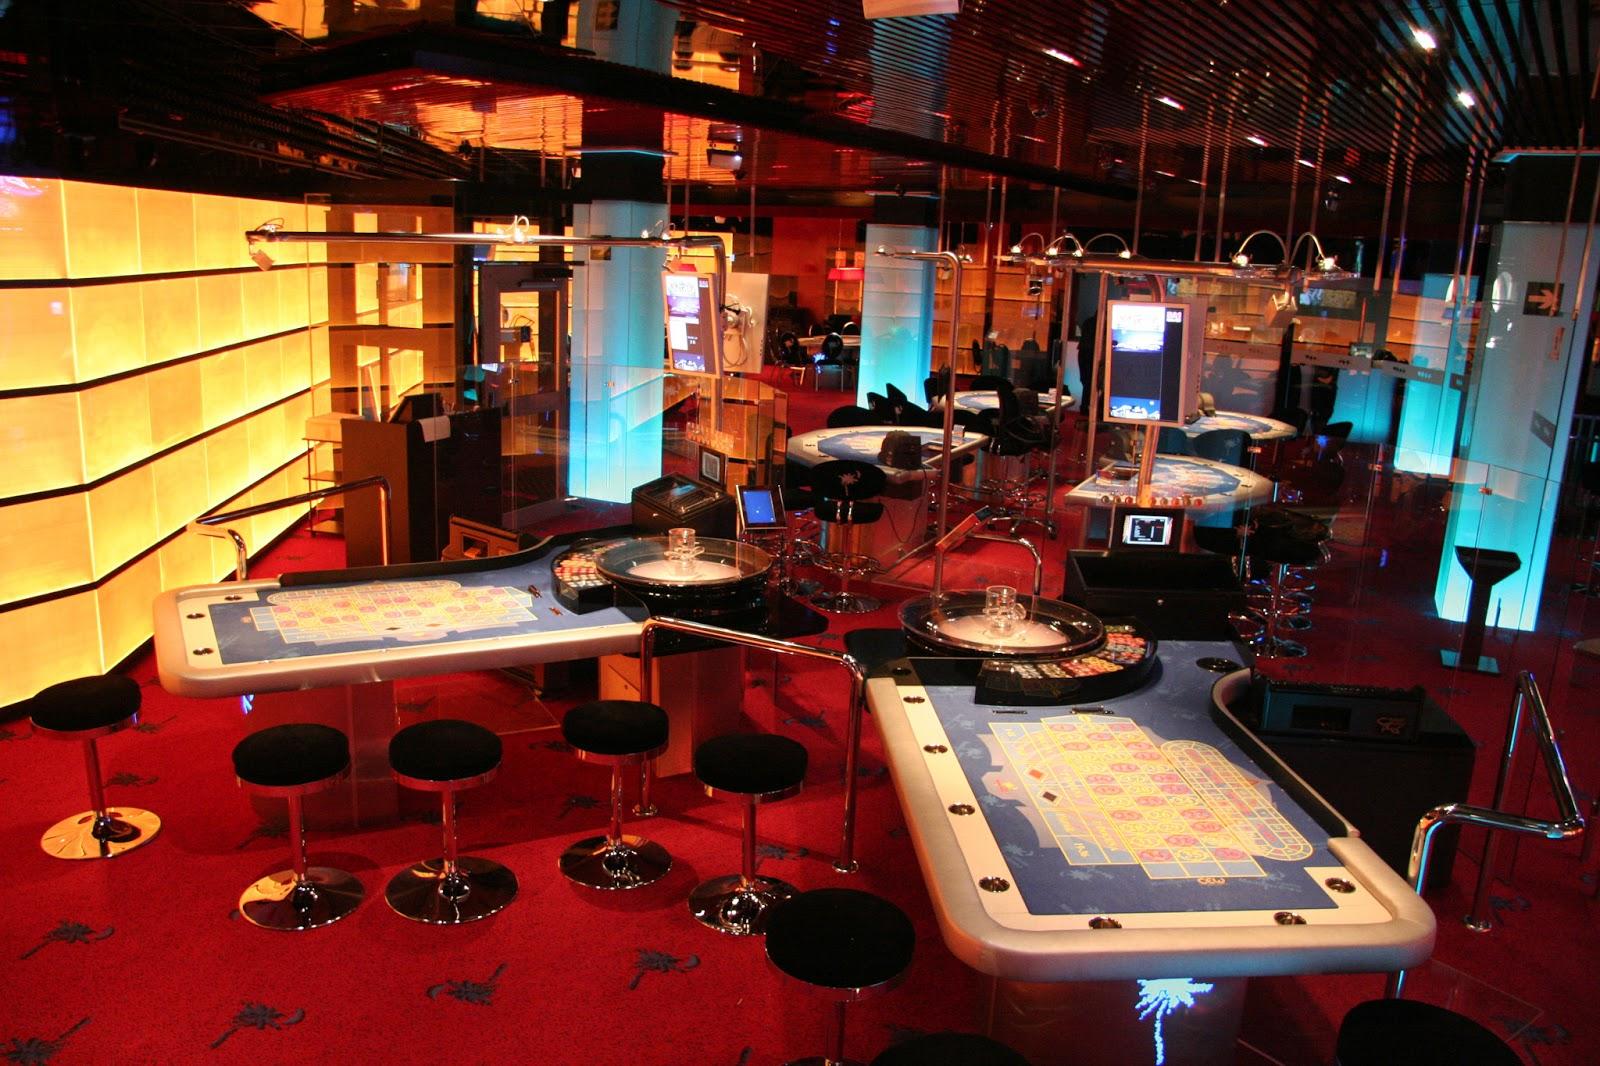 Casino alicante poker ganadores the hard rock casino in biloxi